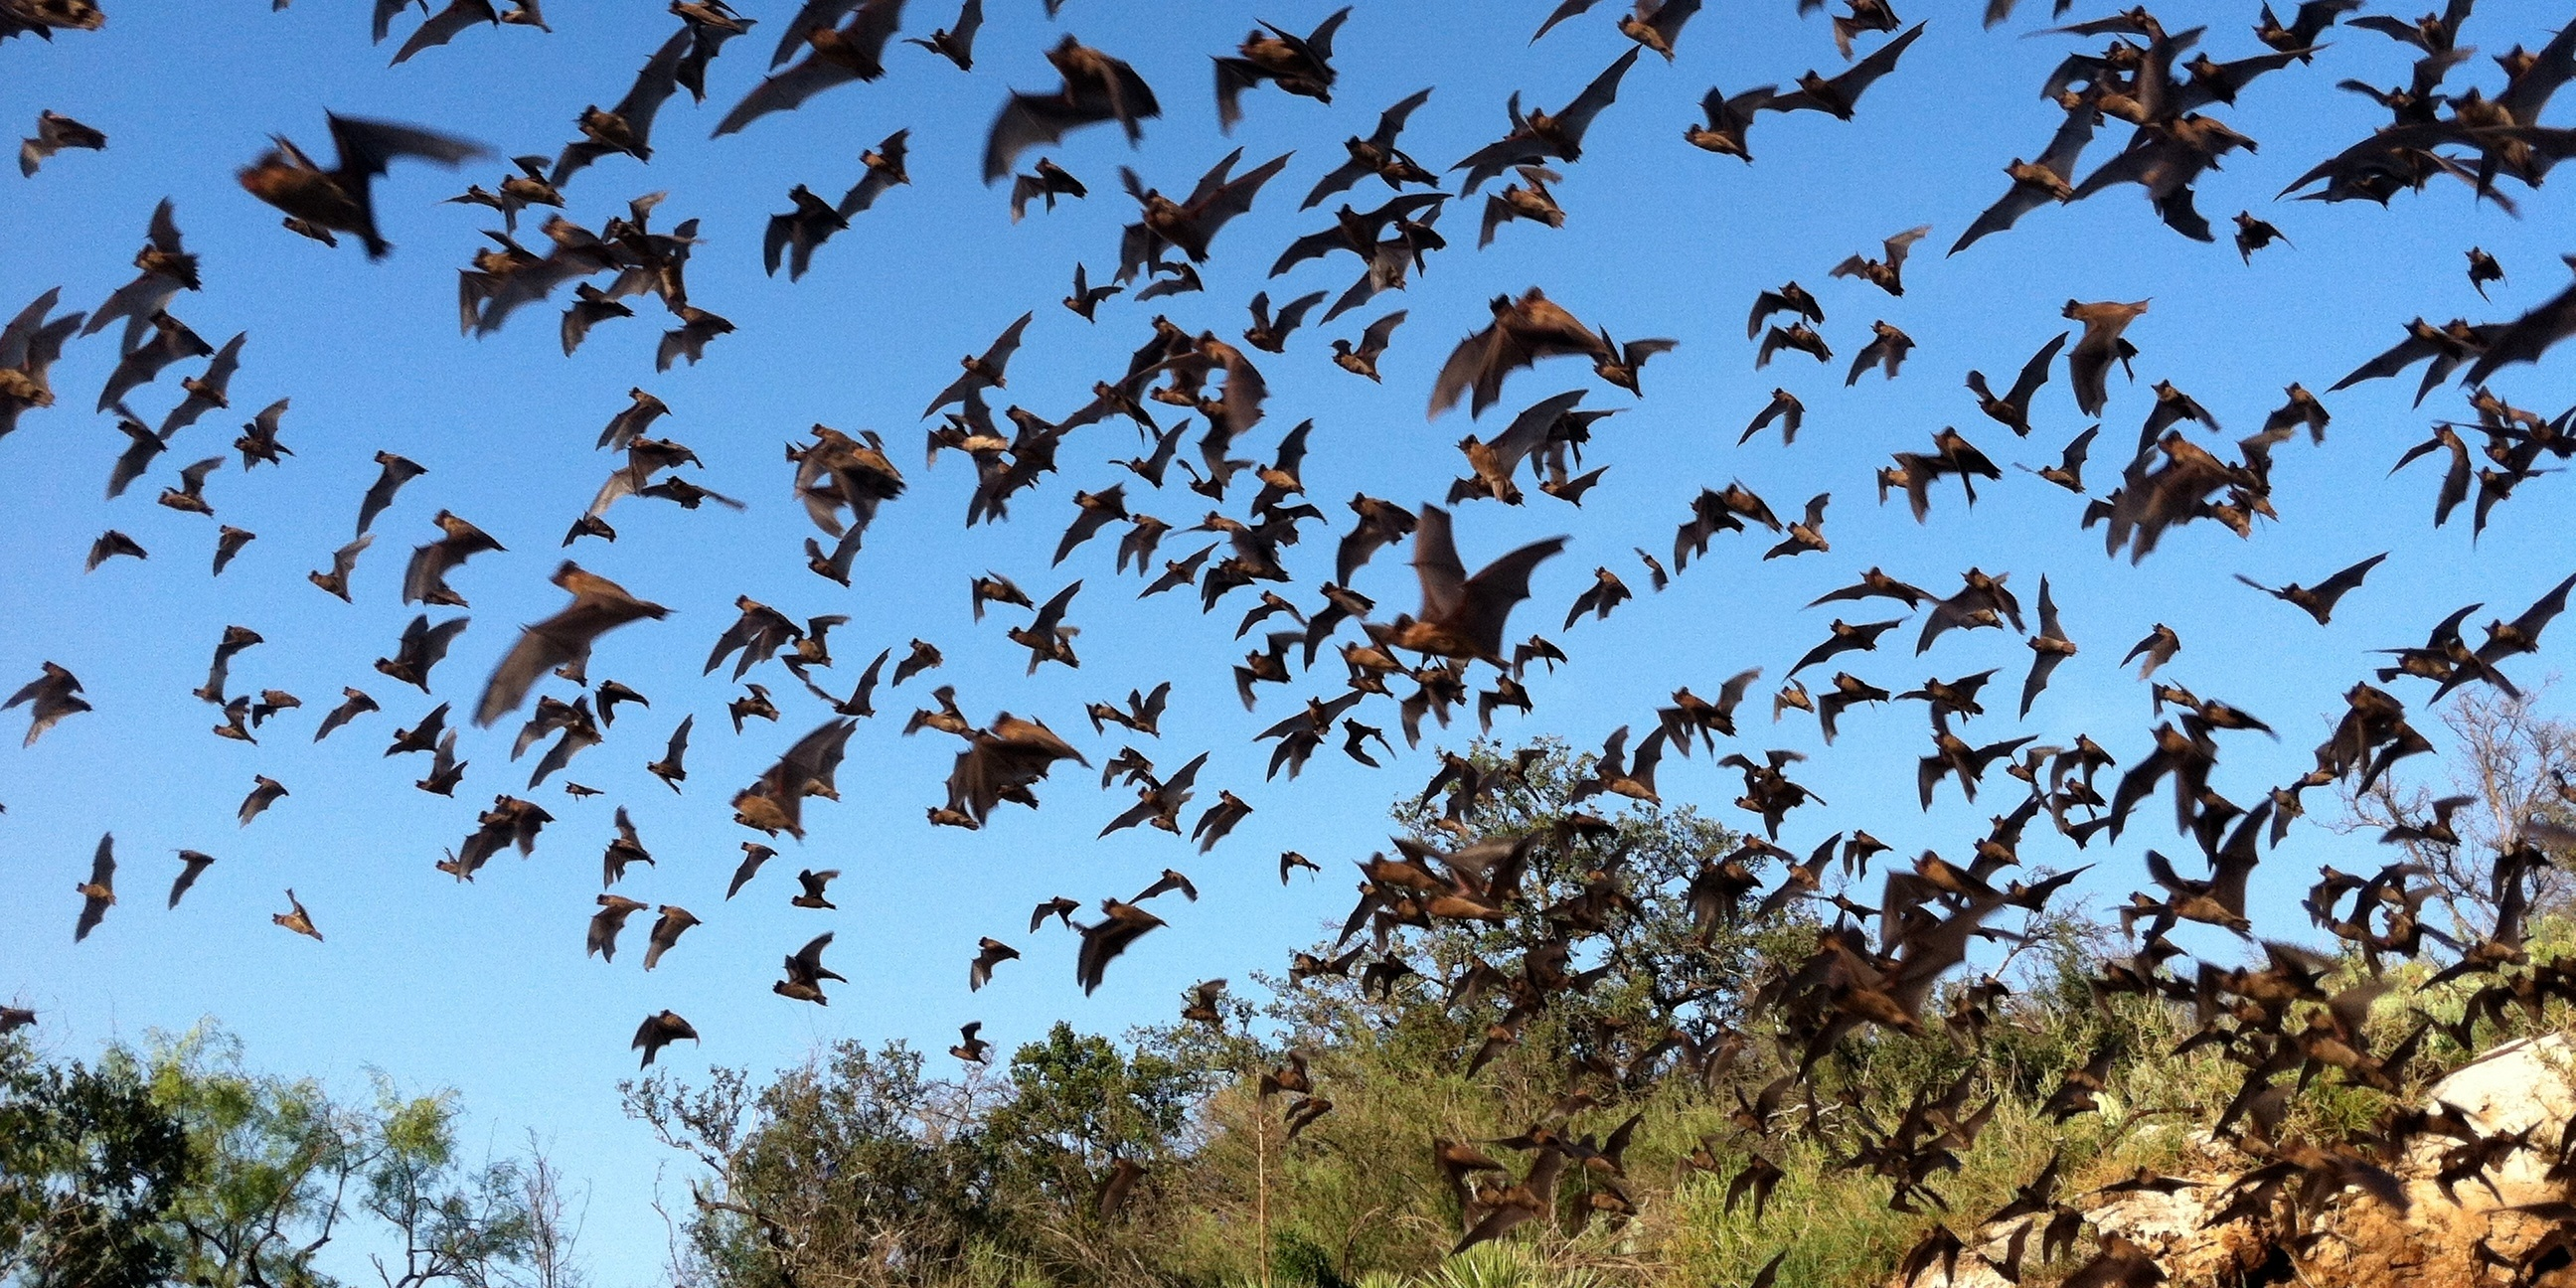 bats-solution-mosquitoes.jpg